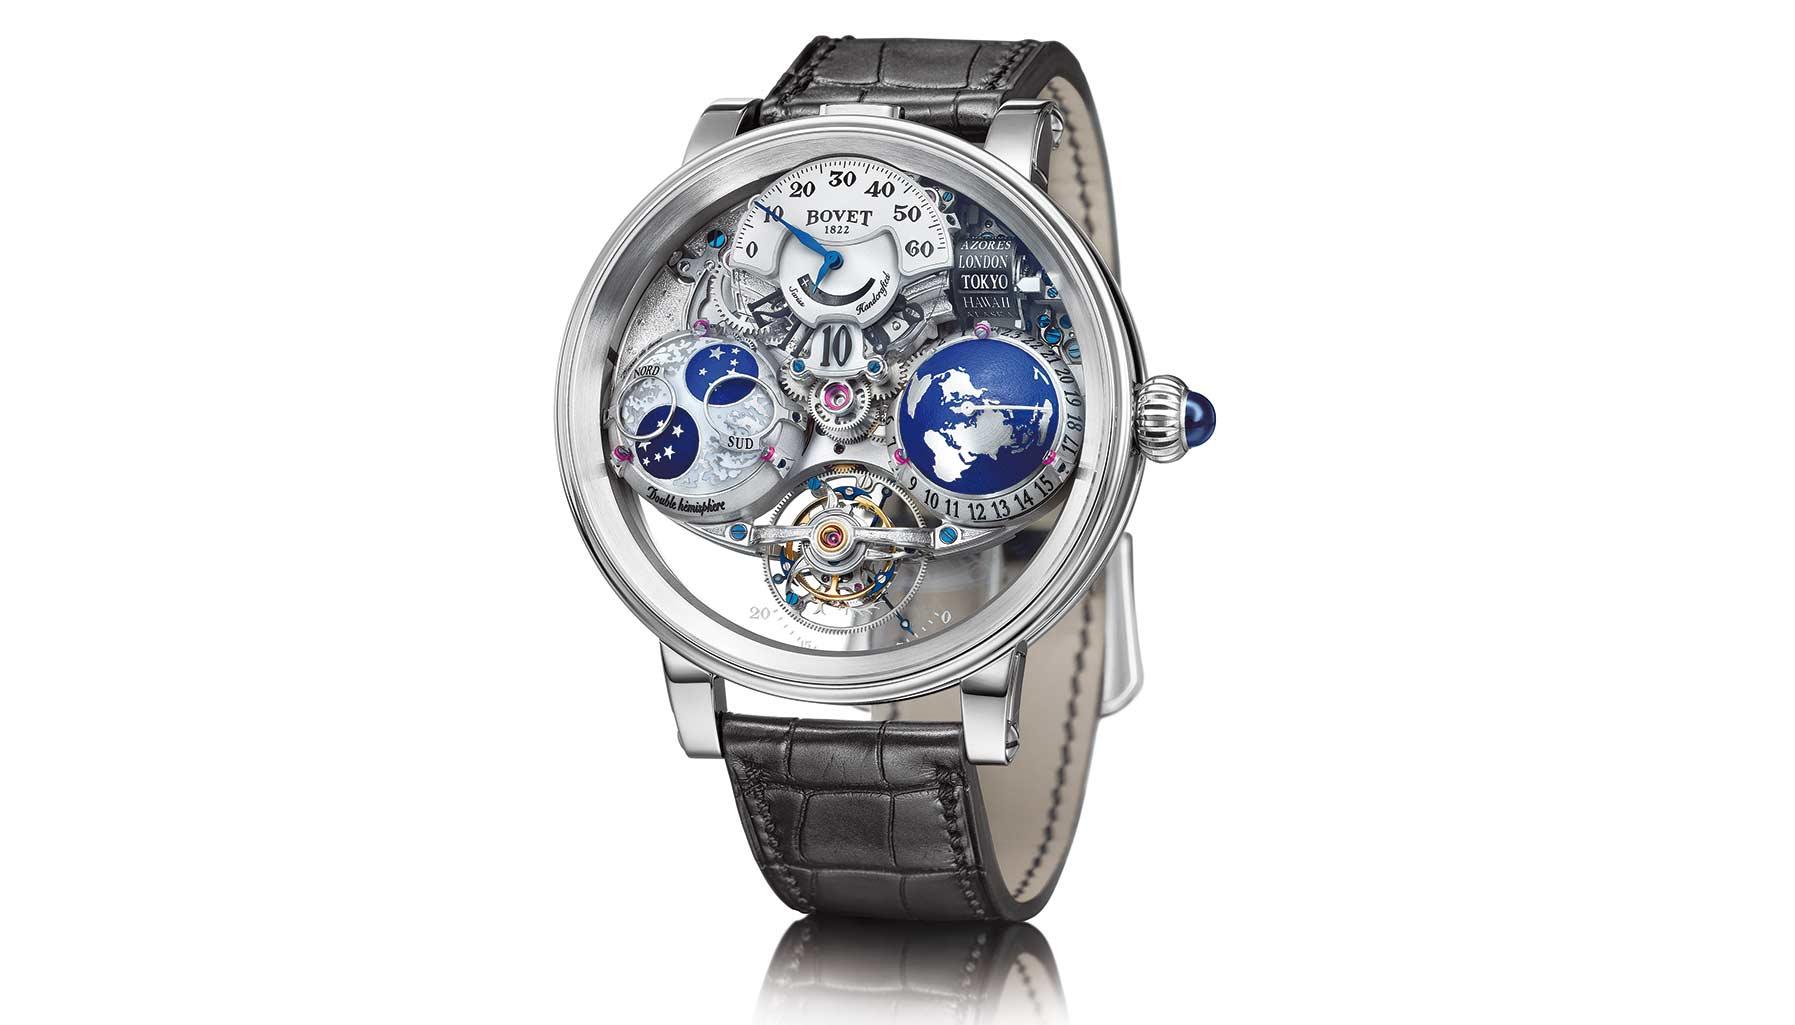 Bovet timepiece